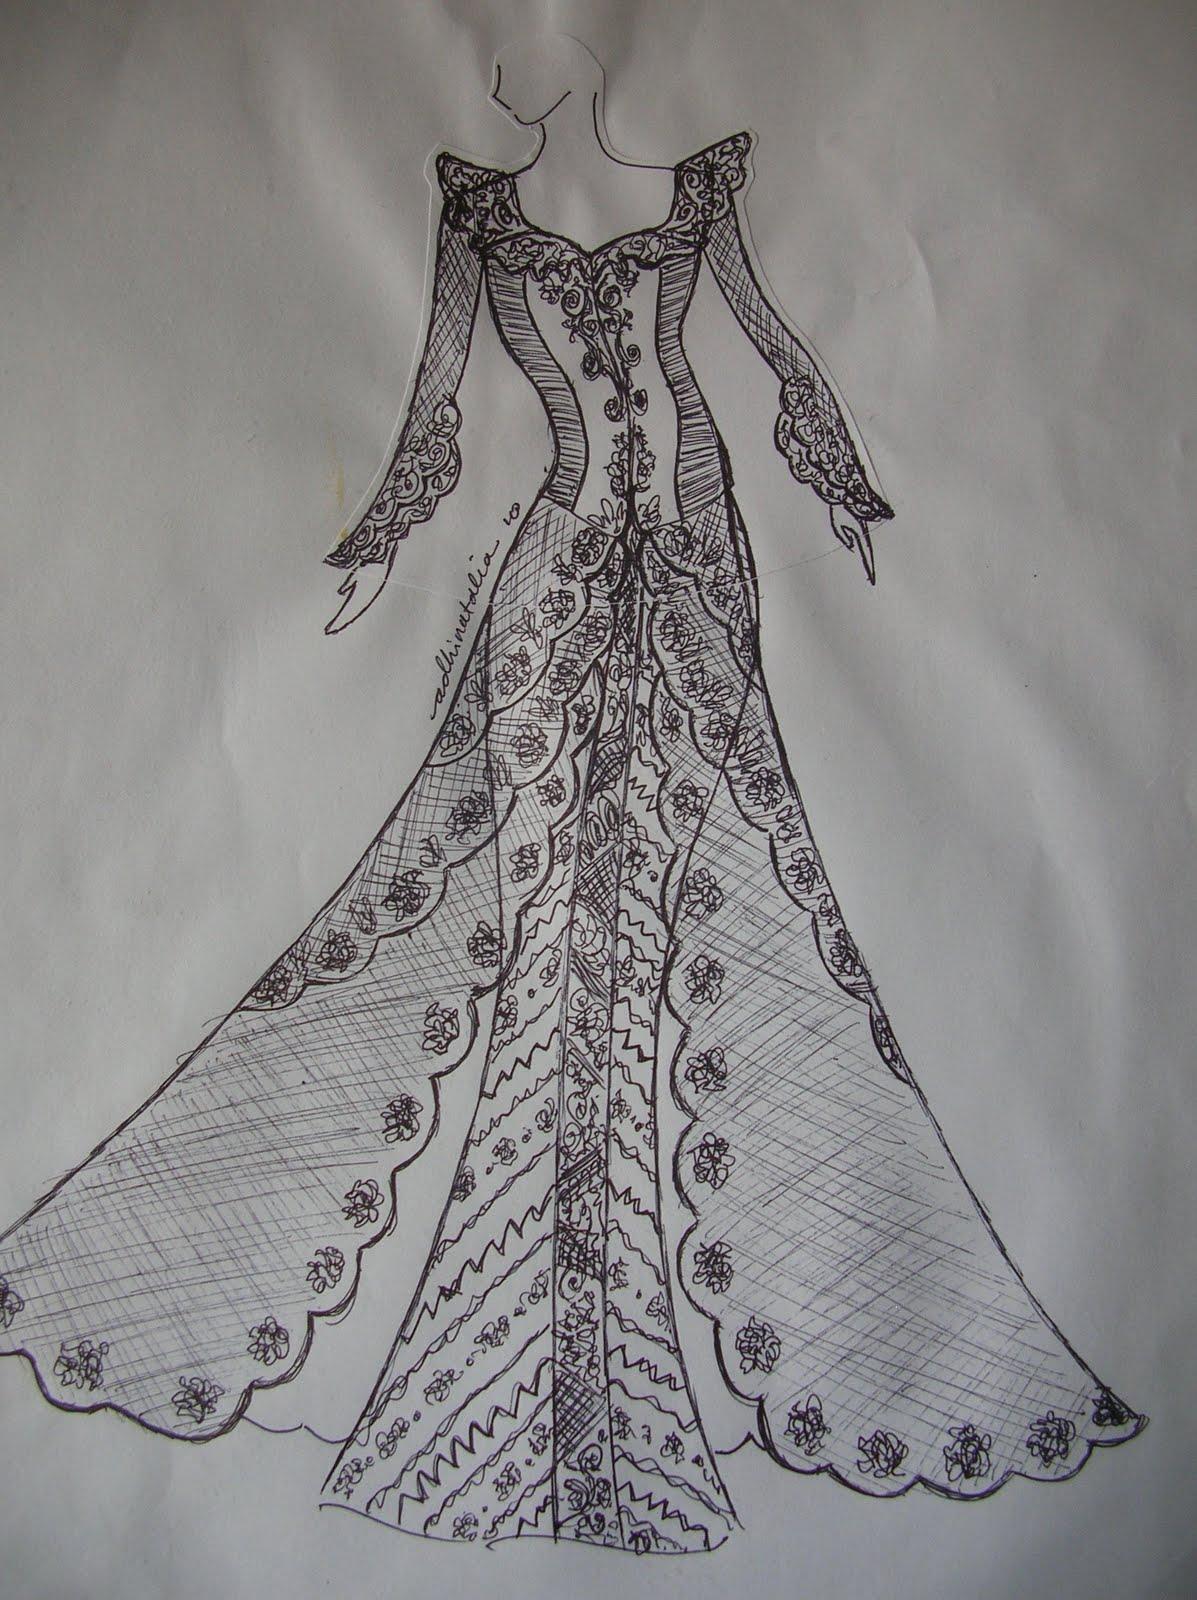 Gambar Sketsa Baju Batik Modern  Sobsketsa